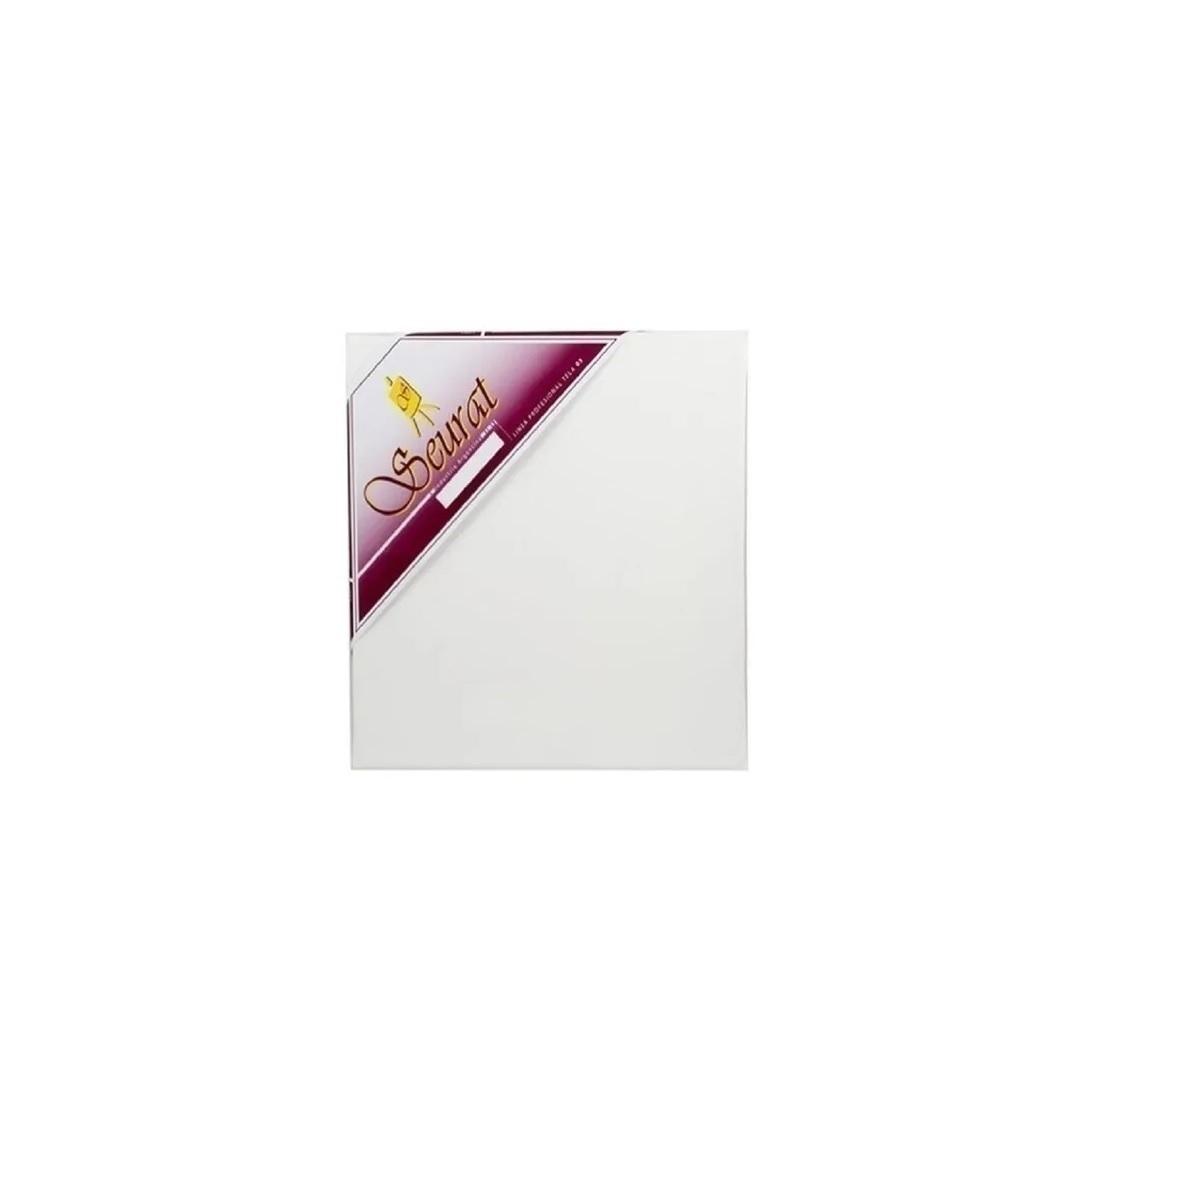 322025 SEURAT                                                       | BASTIDOR 20 X 25 CM TELA ESTUDIO GRANO FINO M-2 (2,5X3,5 CM)